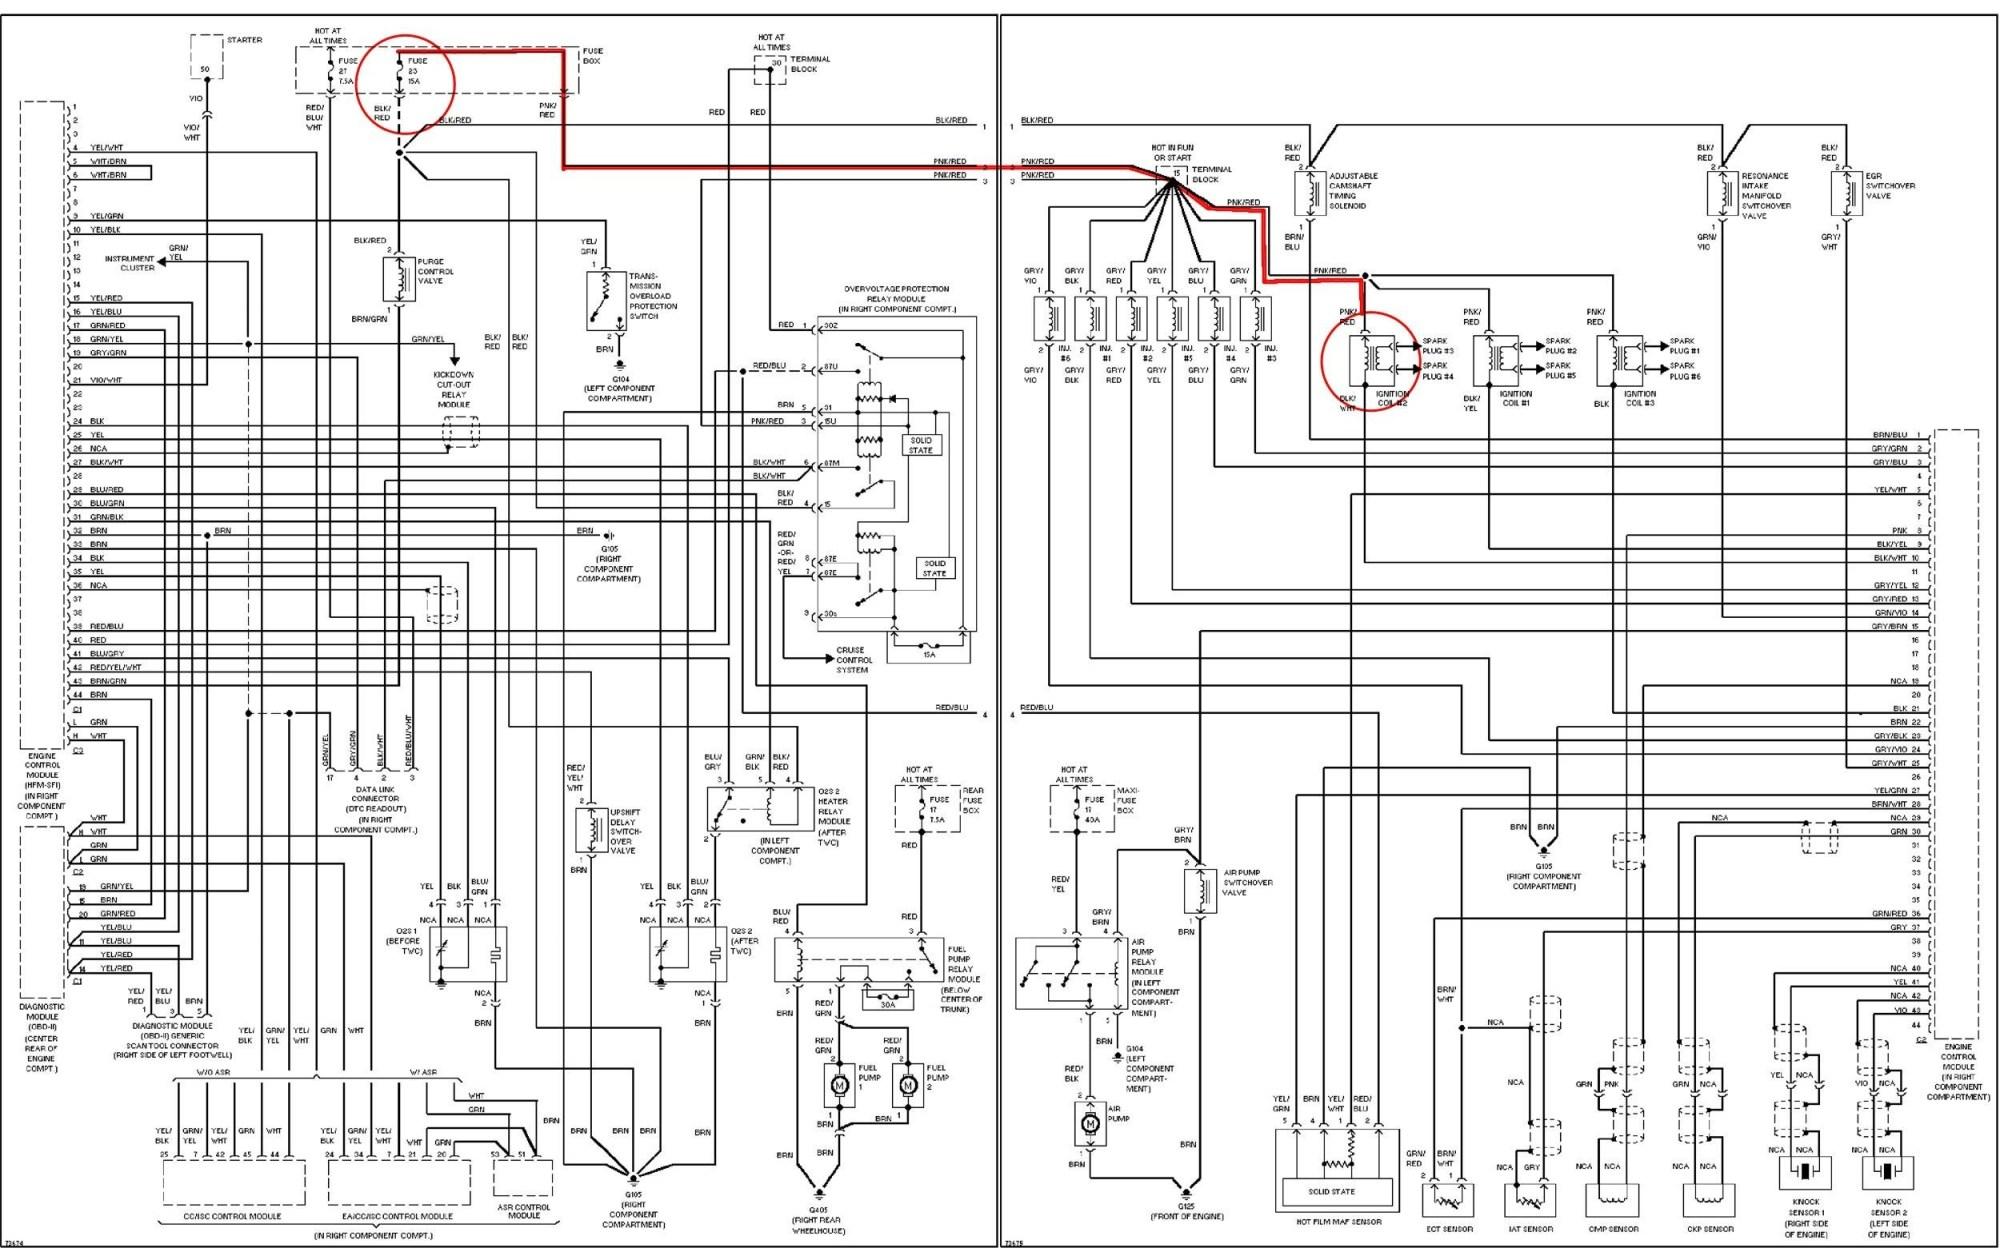 hight resolution of 2003 sprinter 274rls wiring diagram rls u2022 138dhw co 2008 dodge sprinter fuse diagram 2008 sprinter 2500 fuse box diagram